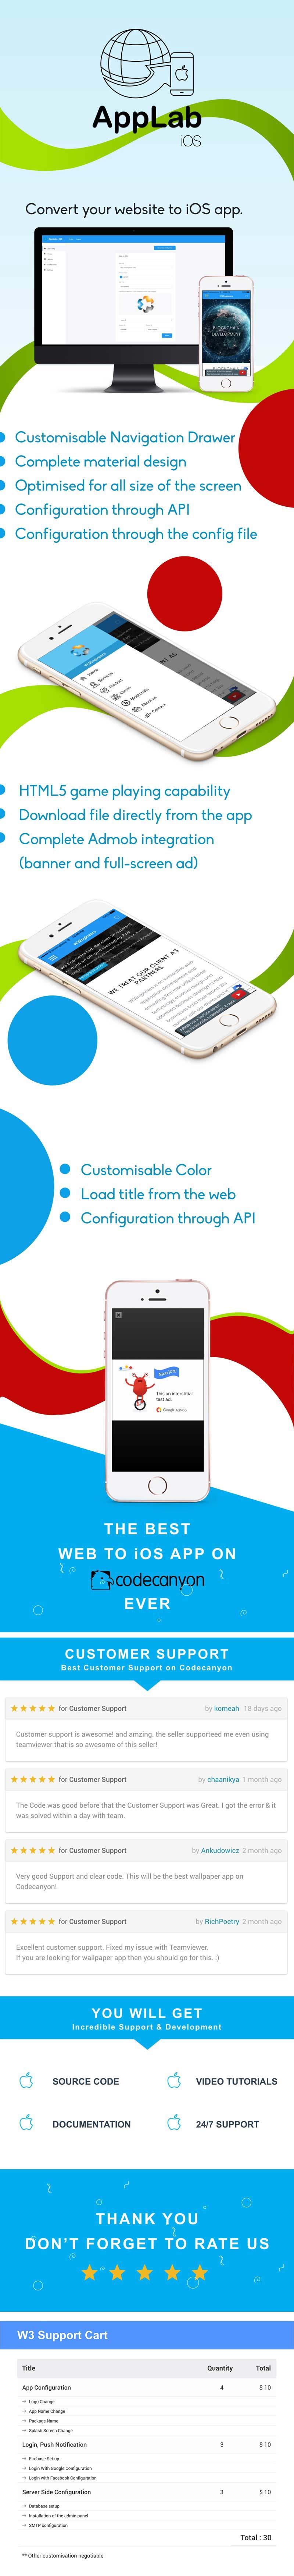 Applab - An Web to iOS App Generator - 7